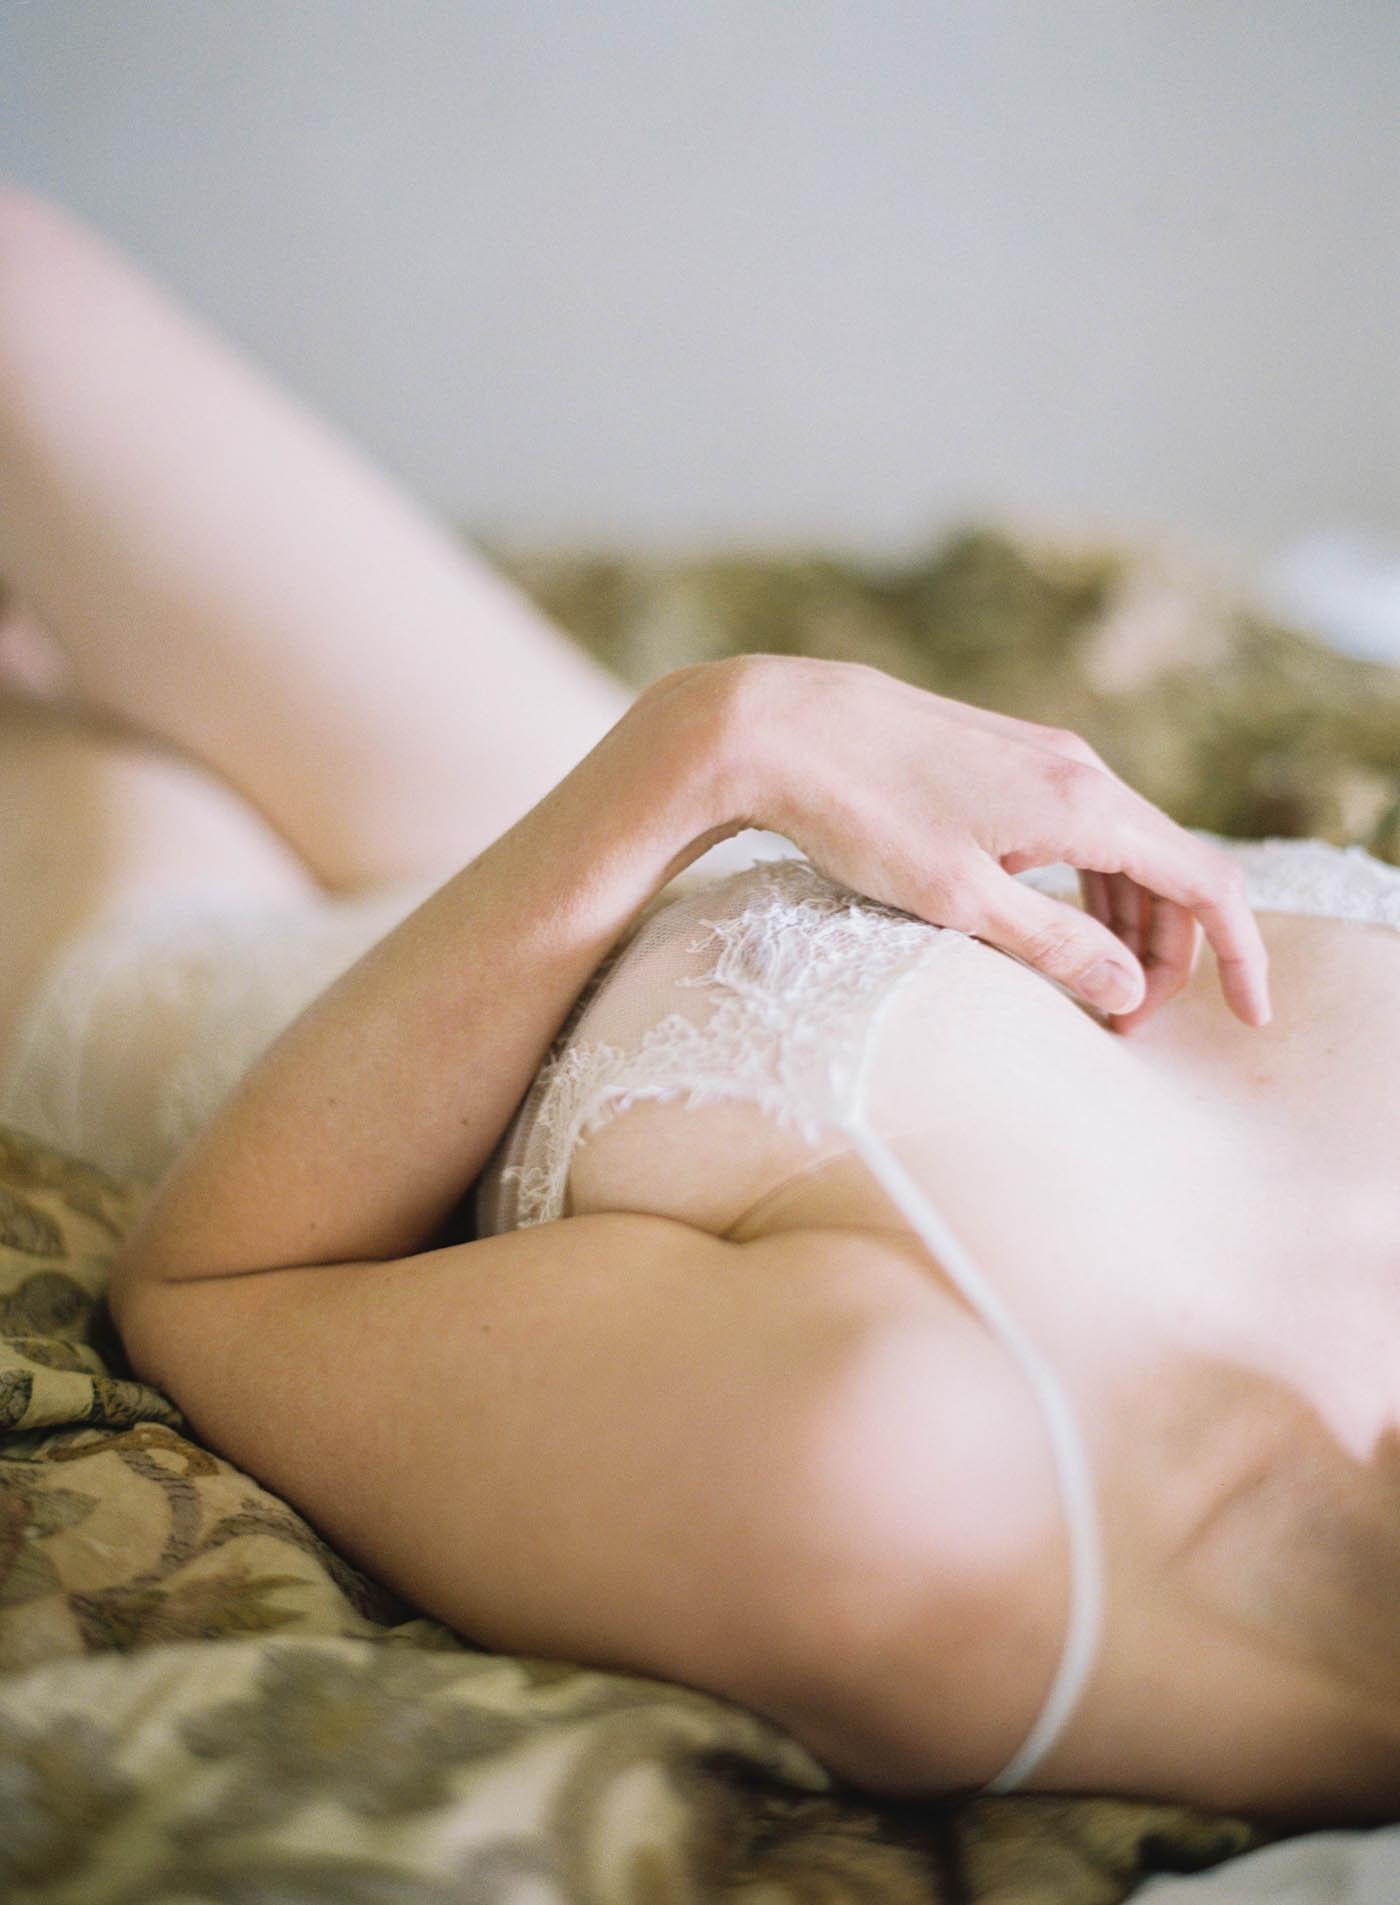 Italian_Villa_Boudoir-3-Jen_Huang-Elan_Jaffke_Boudoir-103-Jen_Huang-006877-R1-001.jpg